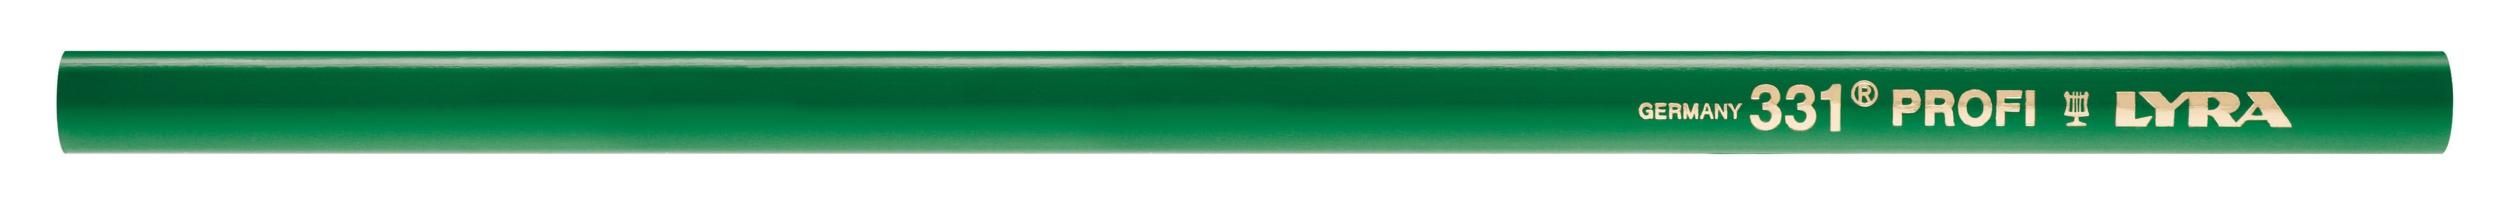 Crayon de Maçon Vert | PROFI 331 | LYRA | Marquage pierre et béton